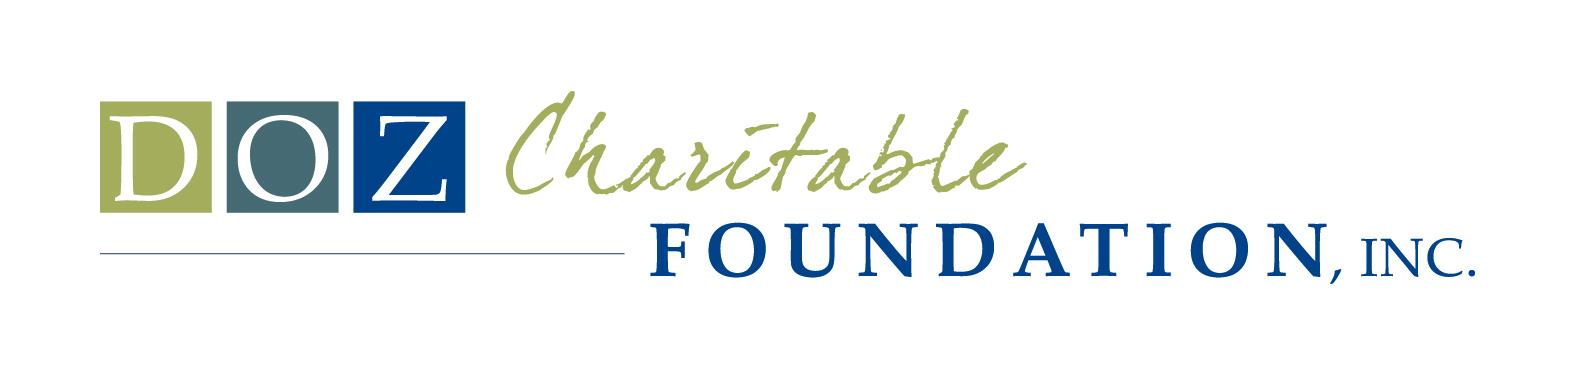 Foundation Logo 3 Color.jpg